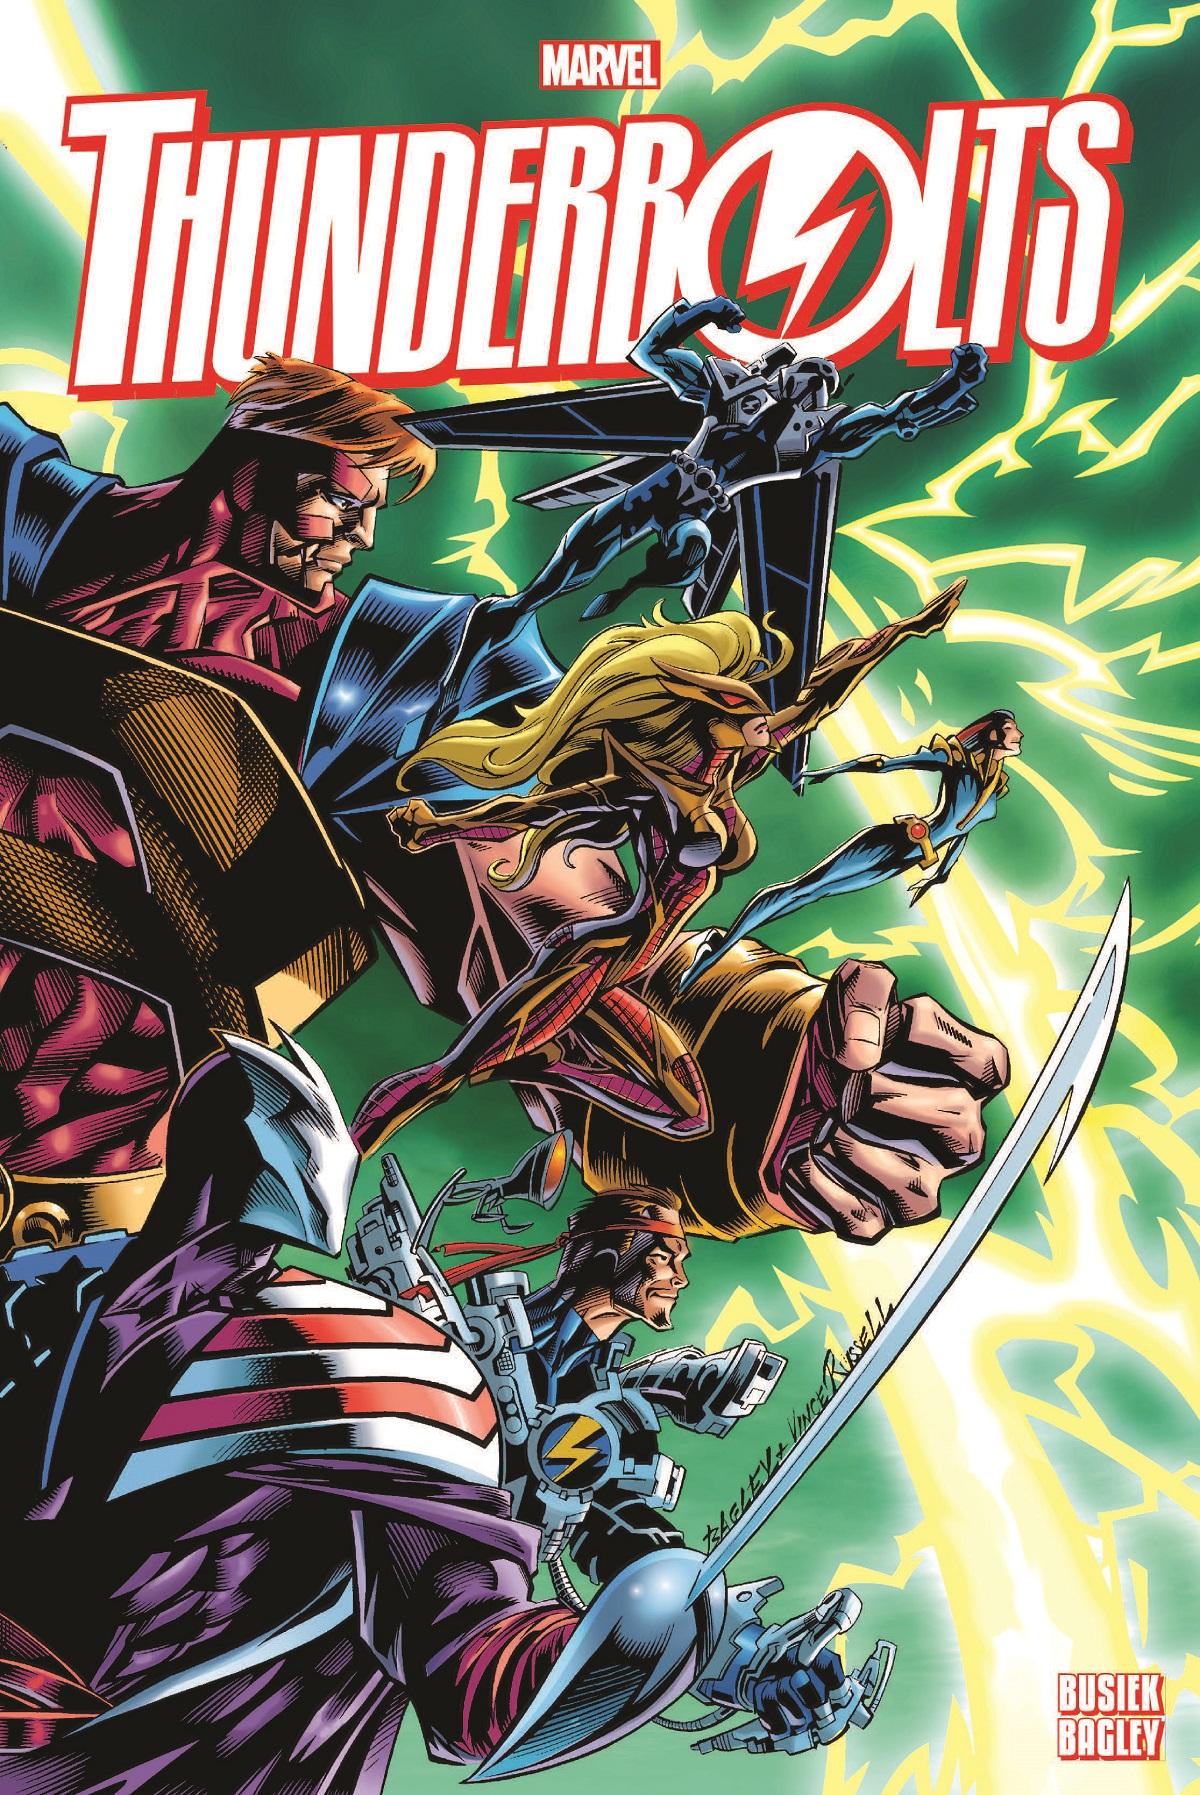 Thunderbolts Omnibus Vol. 1 (Hardcover)